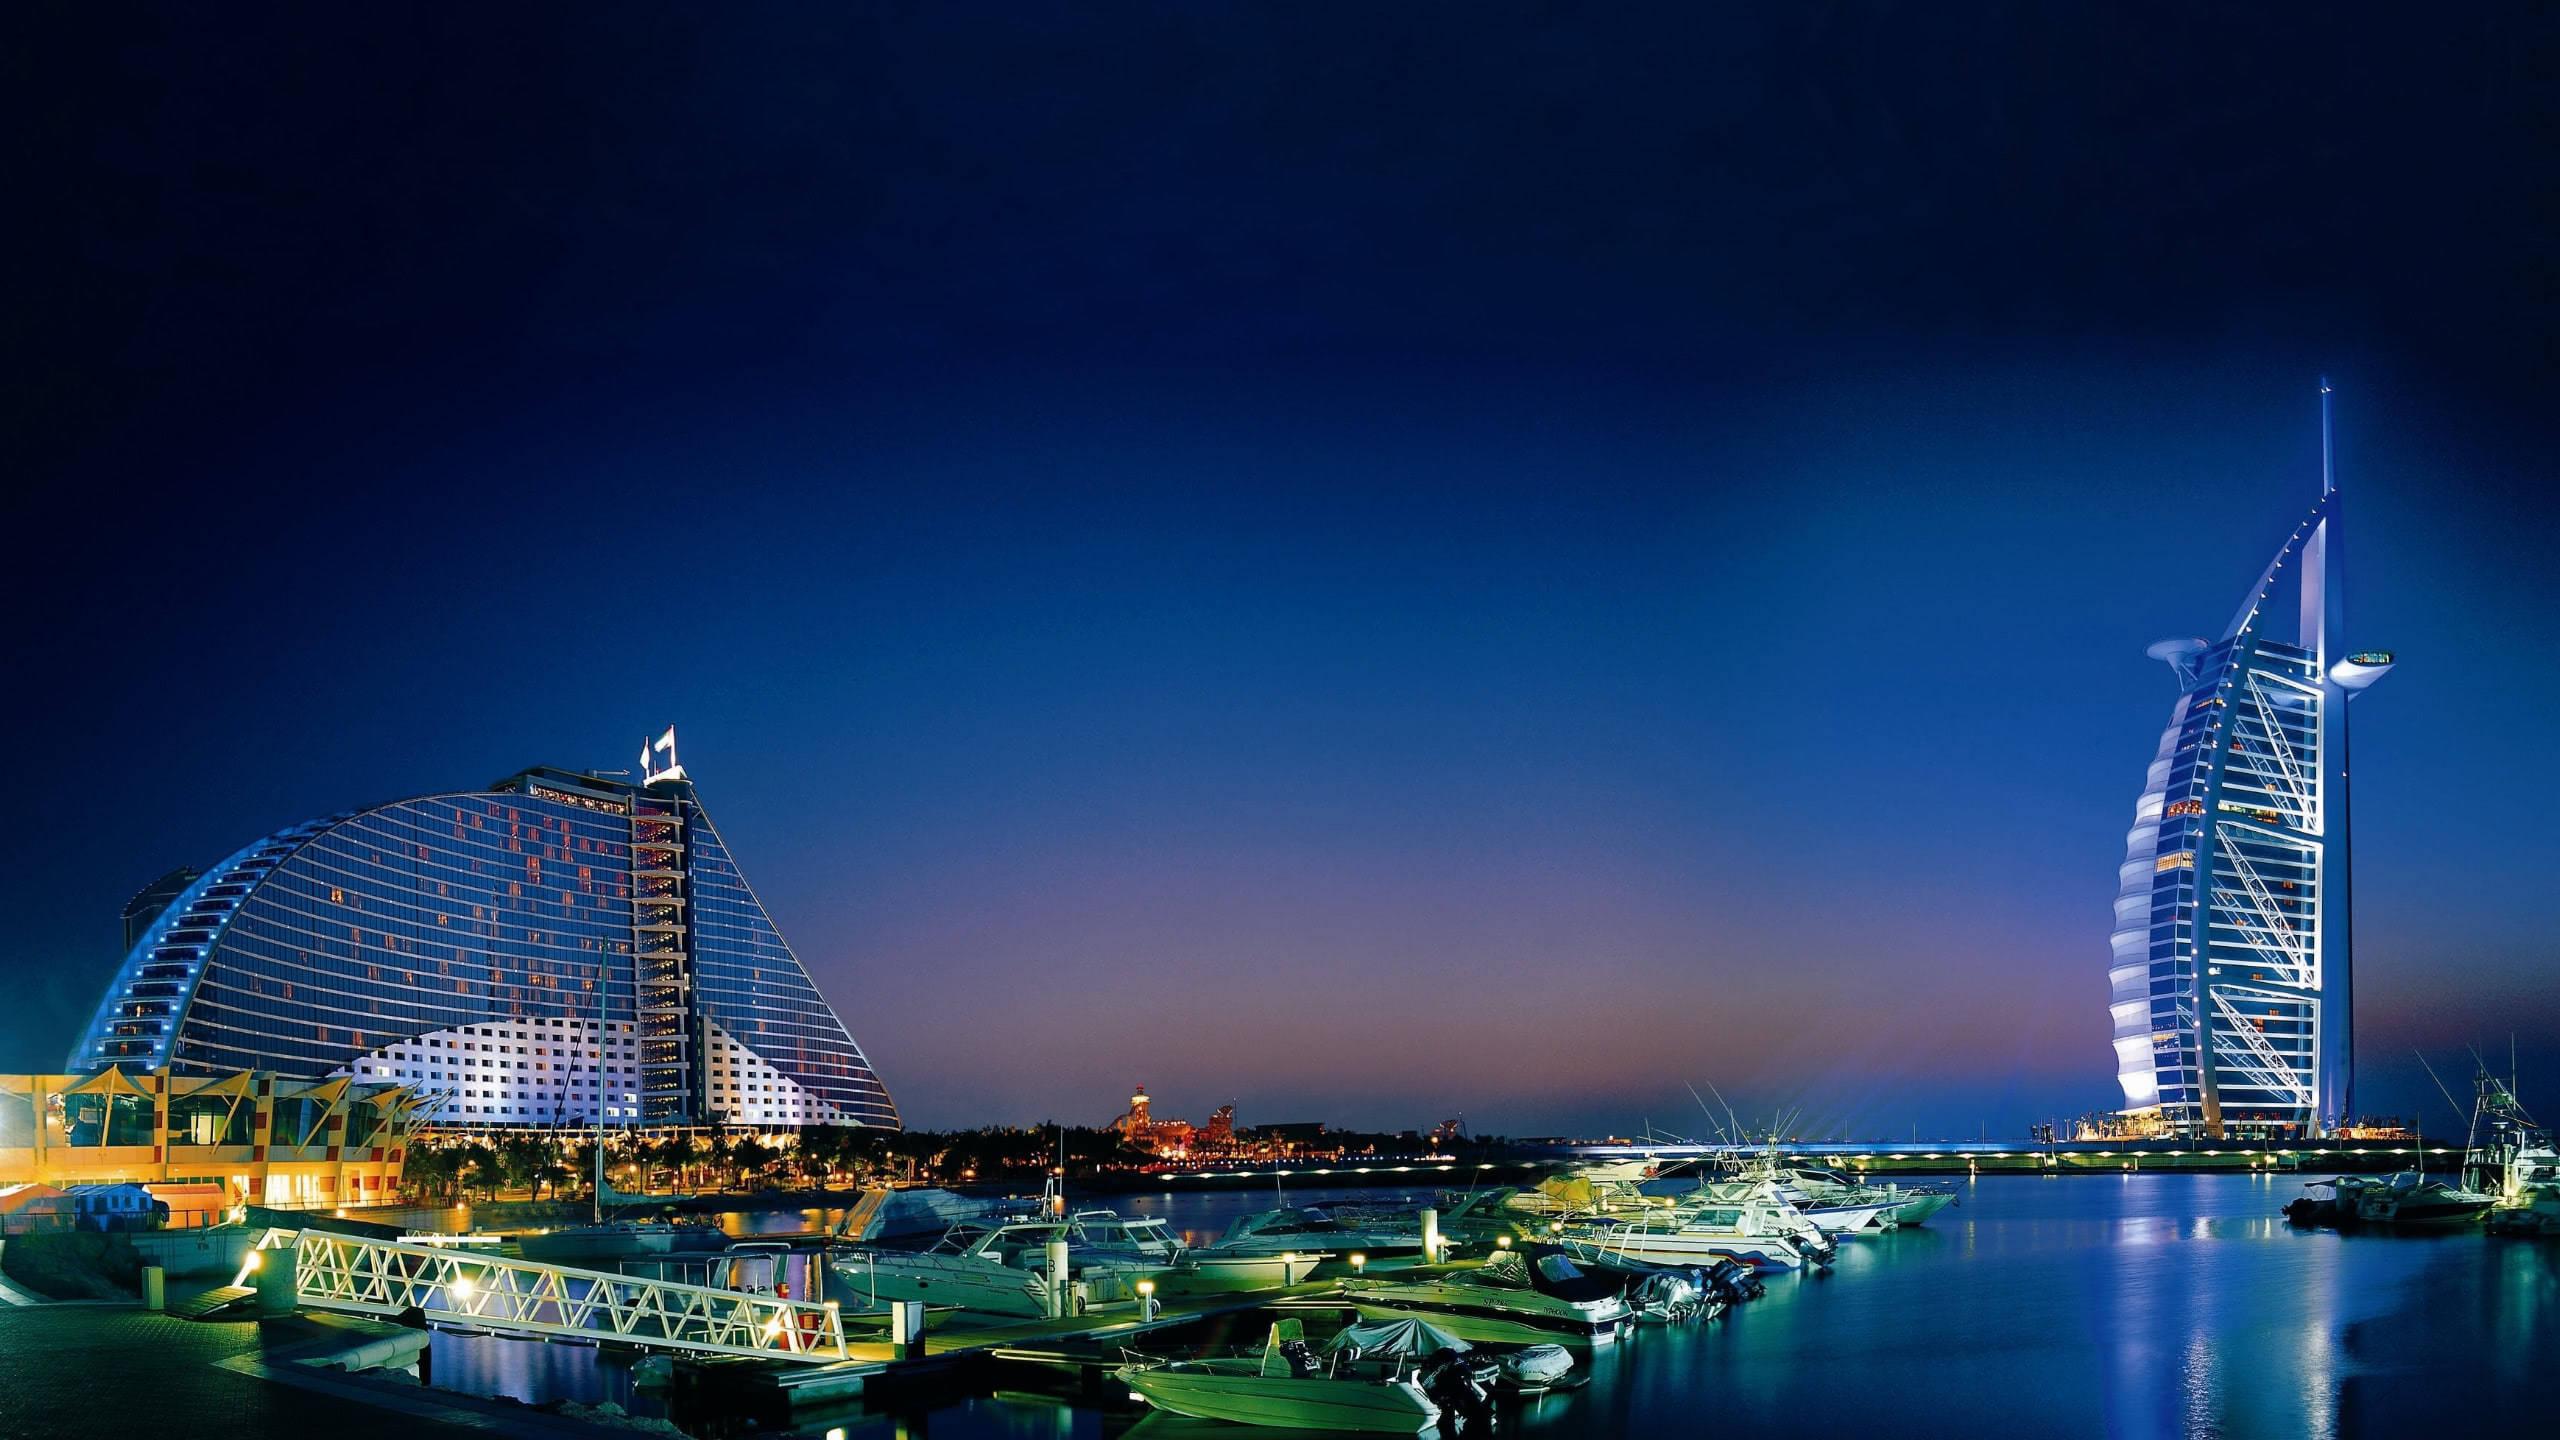 jumeirah beach hotel burj al arab dubai united arab emirates wqhd 1440p wallpaper